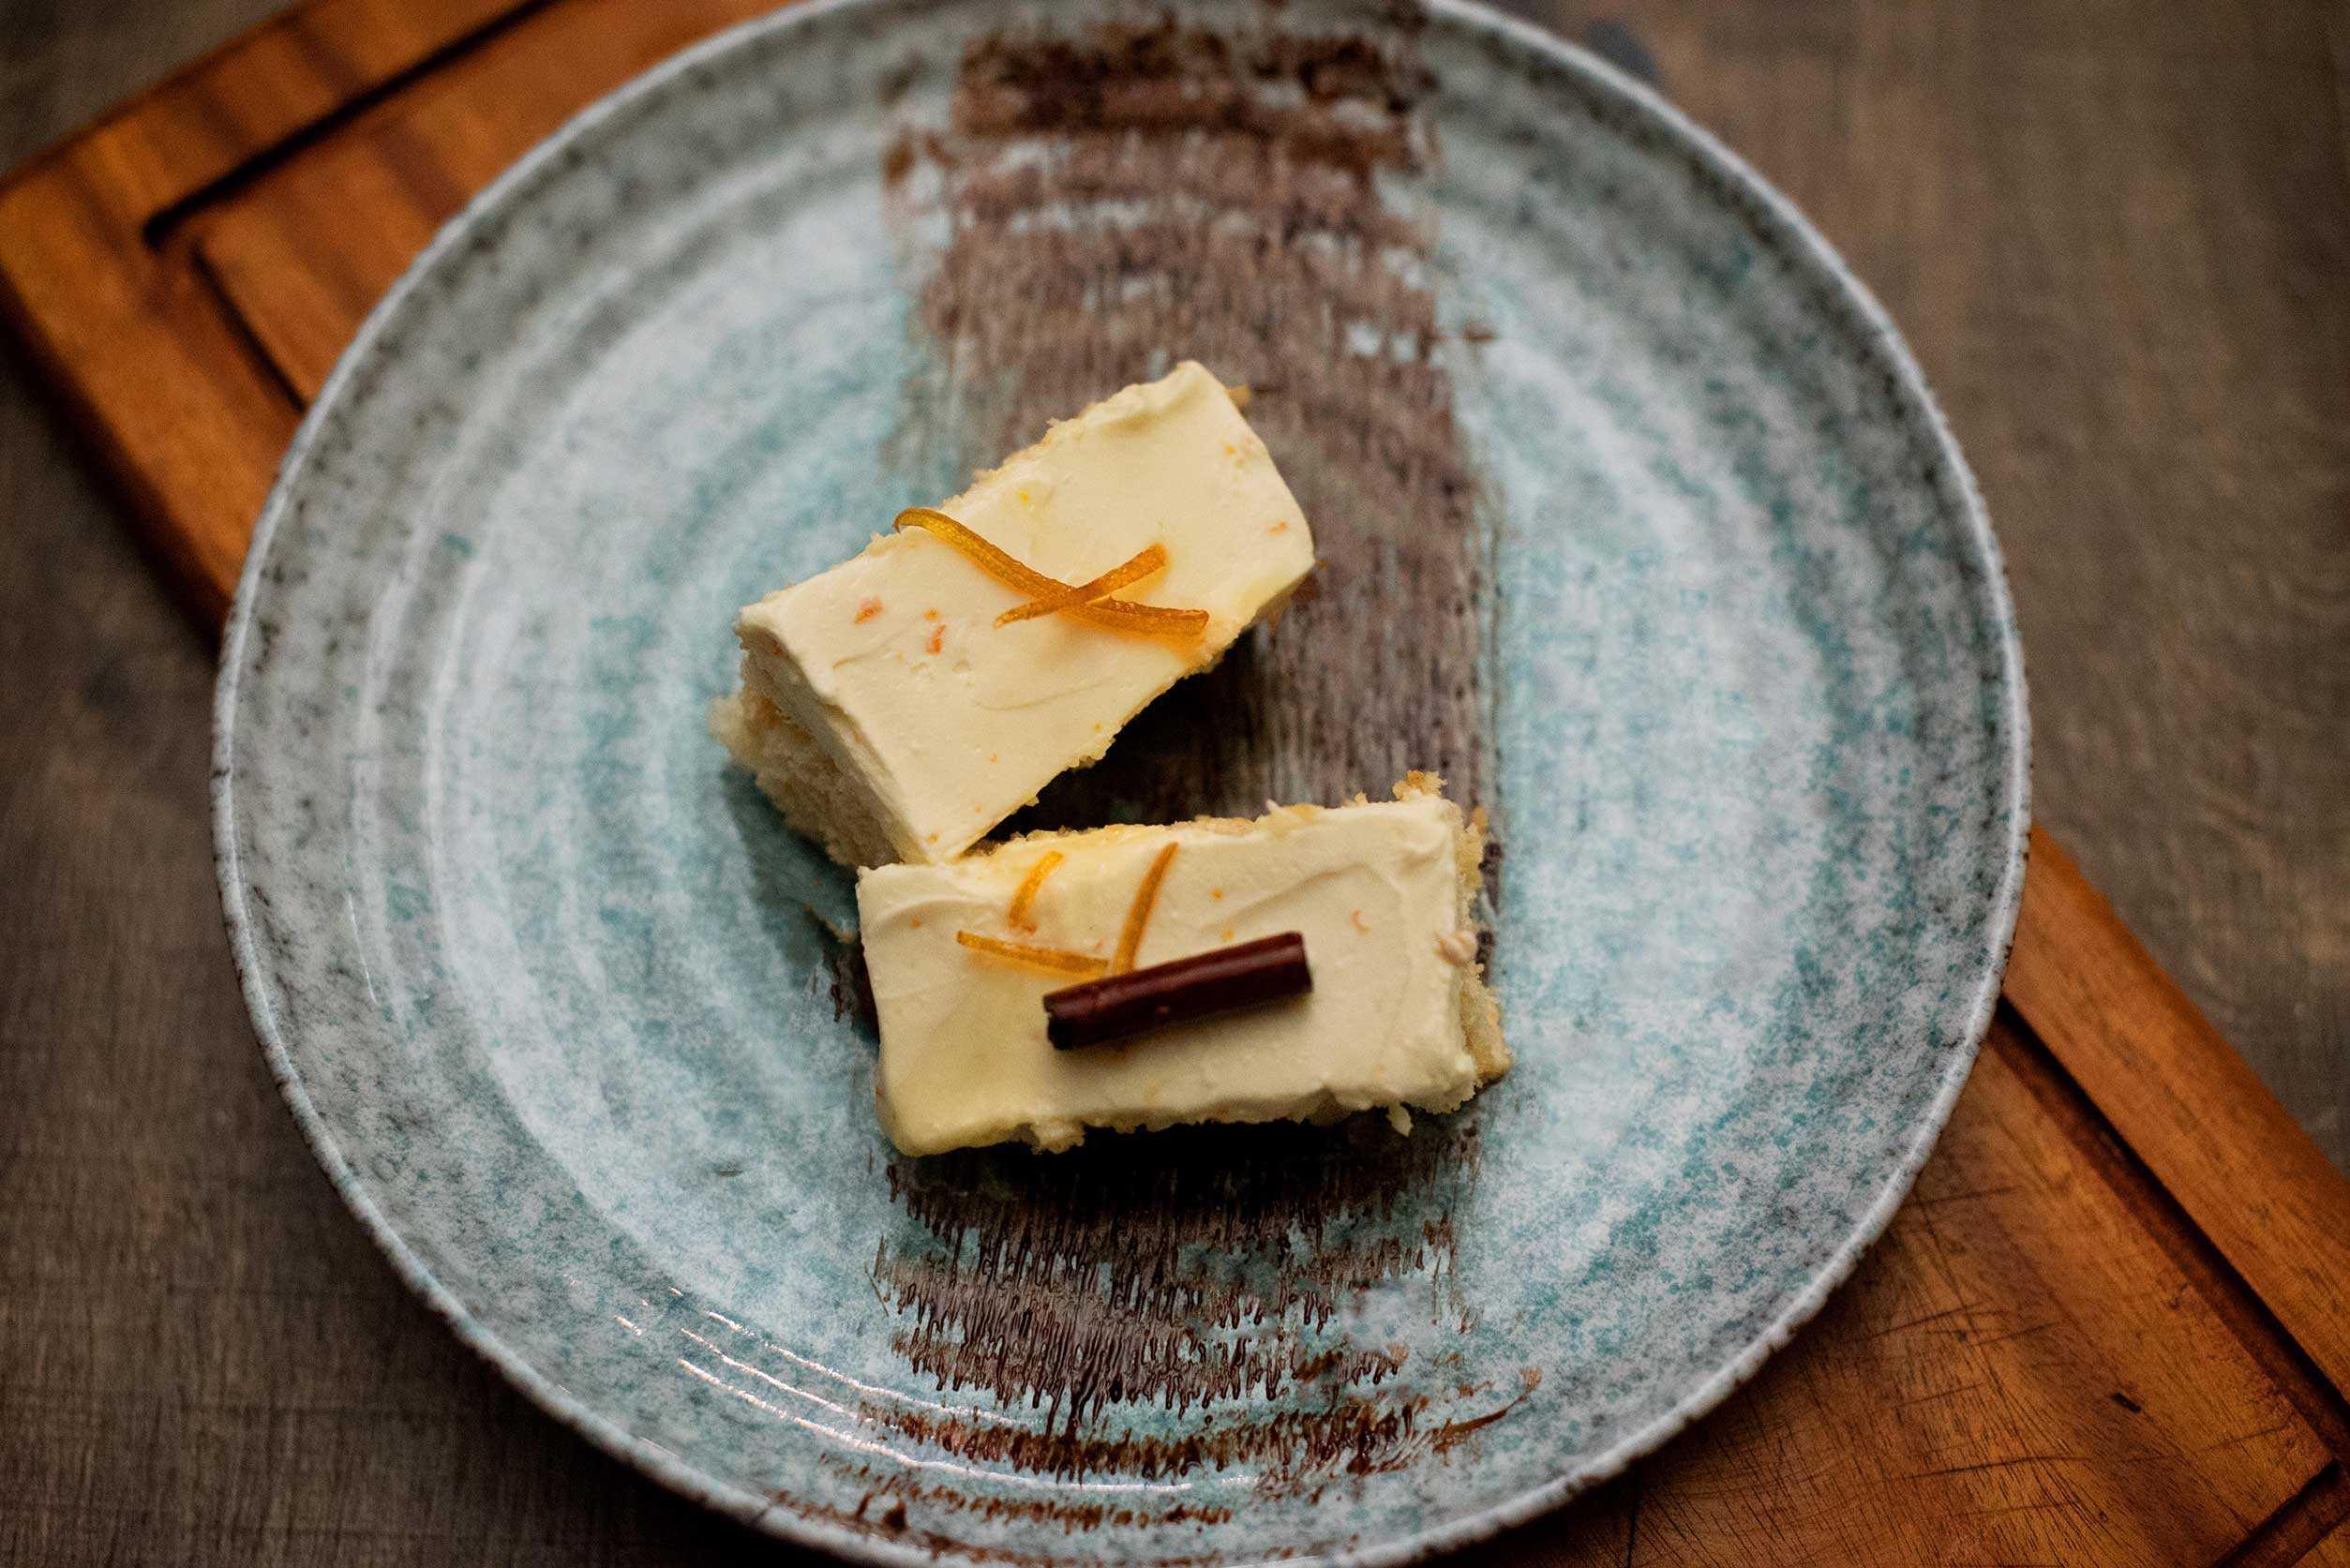 A classic tiramisu with a tangy twist filled covered in mascarpone cream and savoiardi.